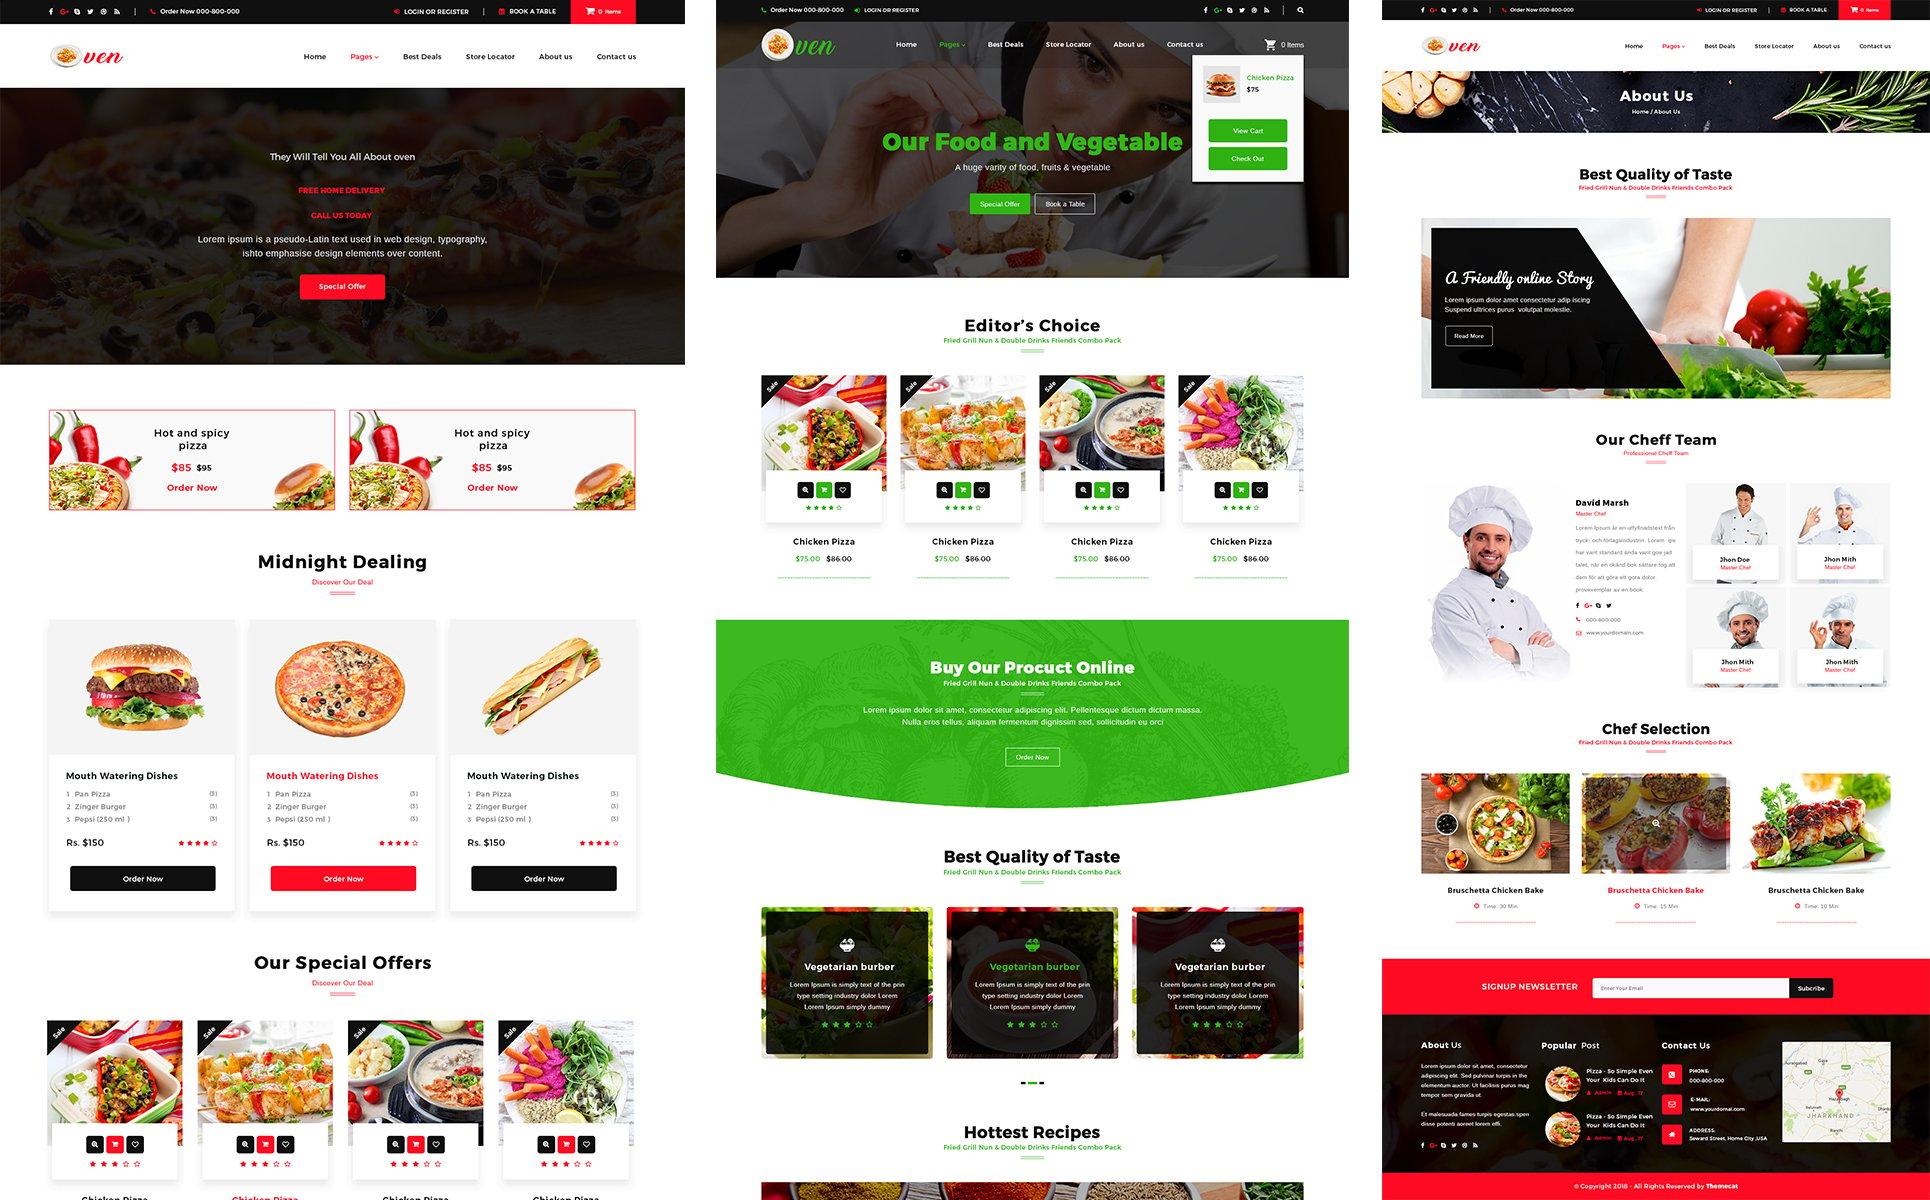 Oven - WooCommerce Restaurant PSD Template